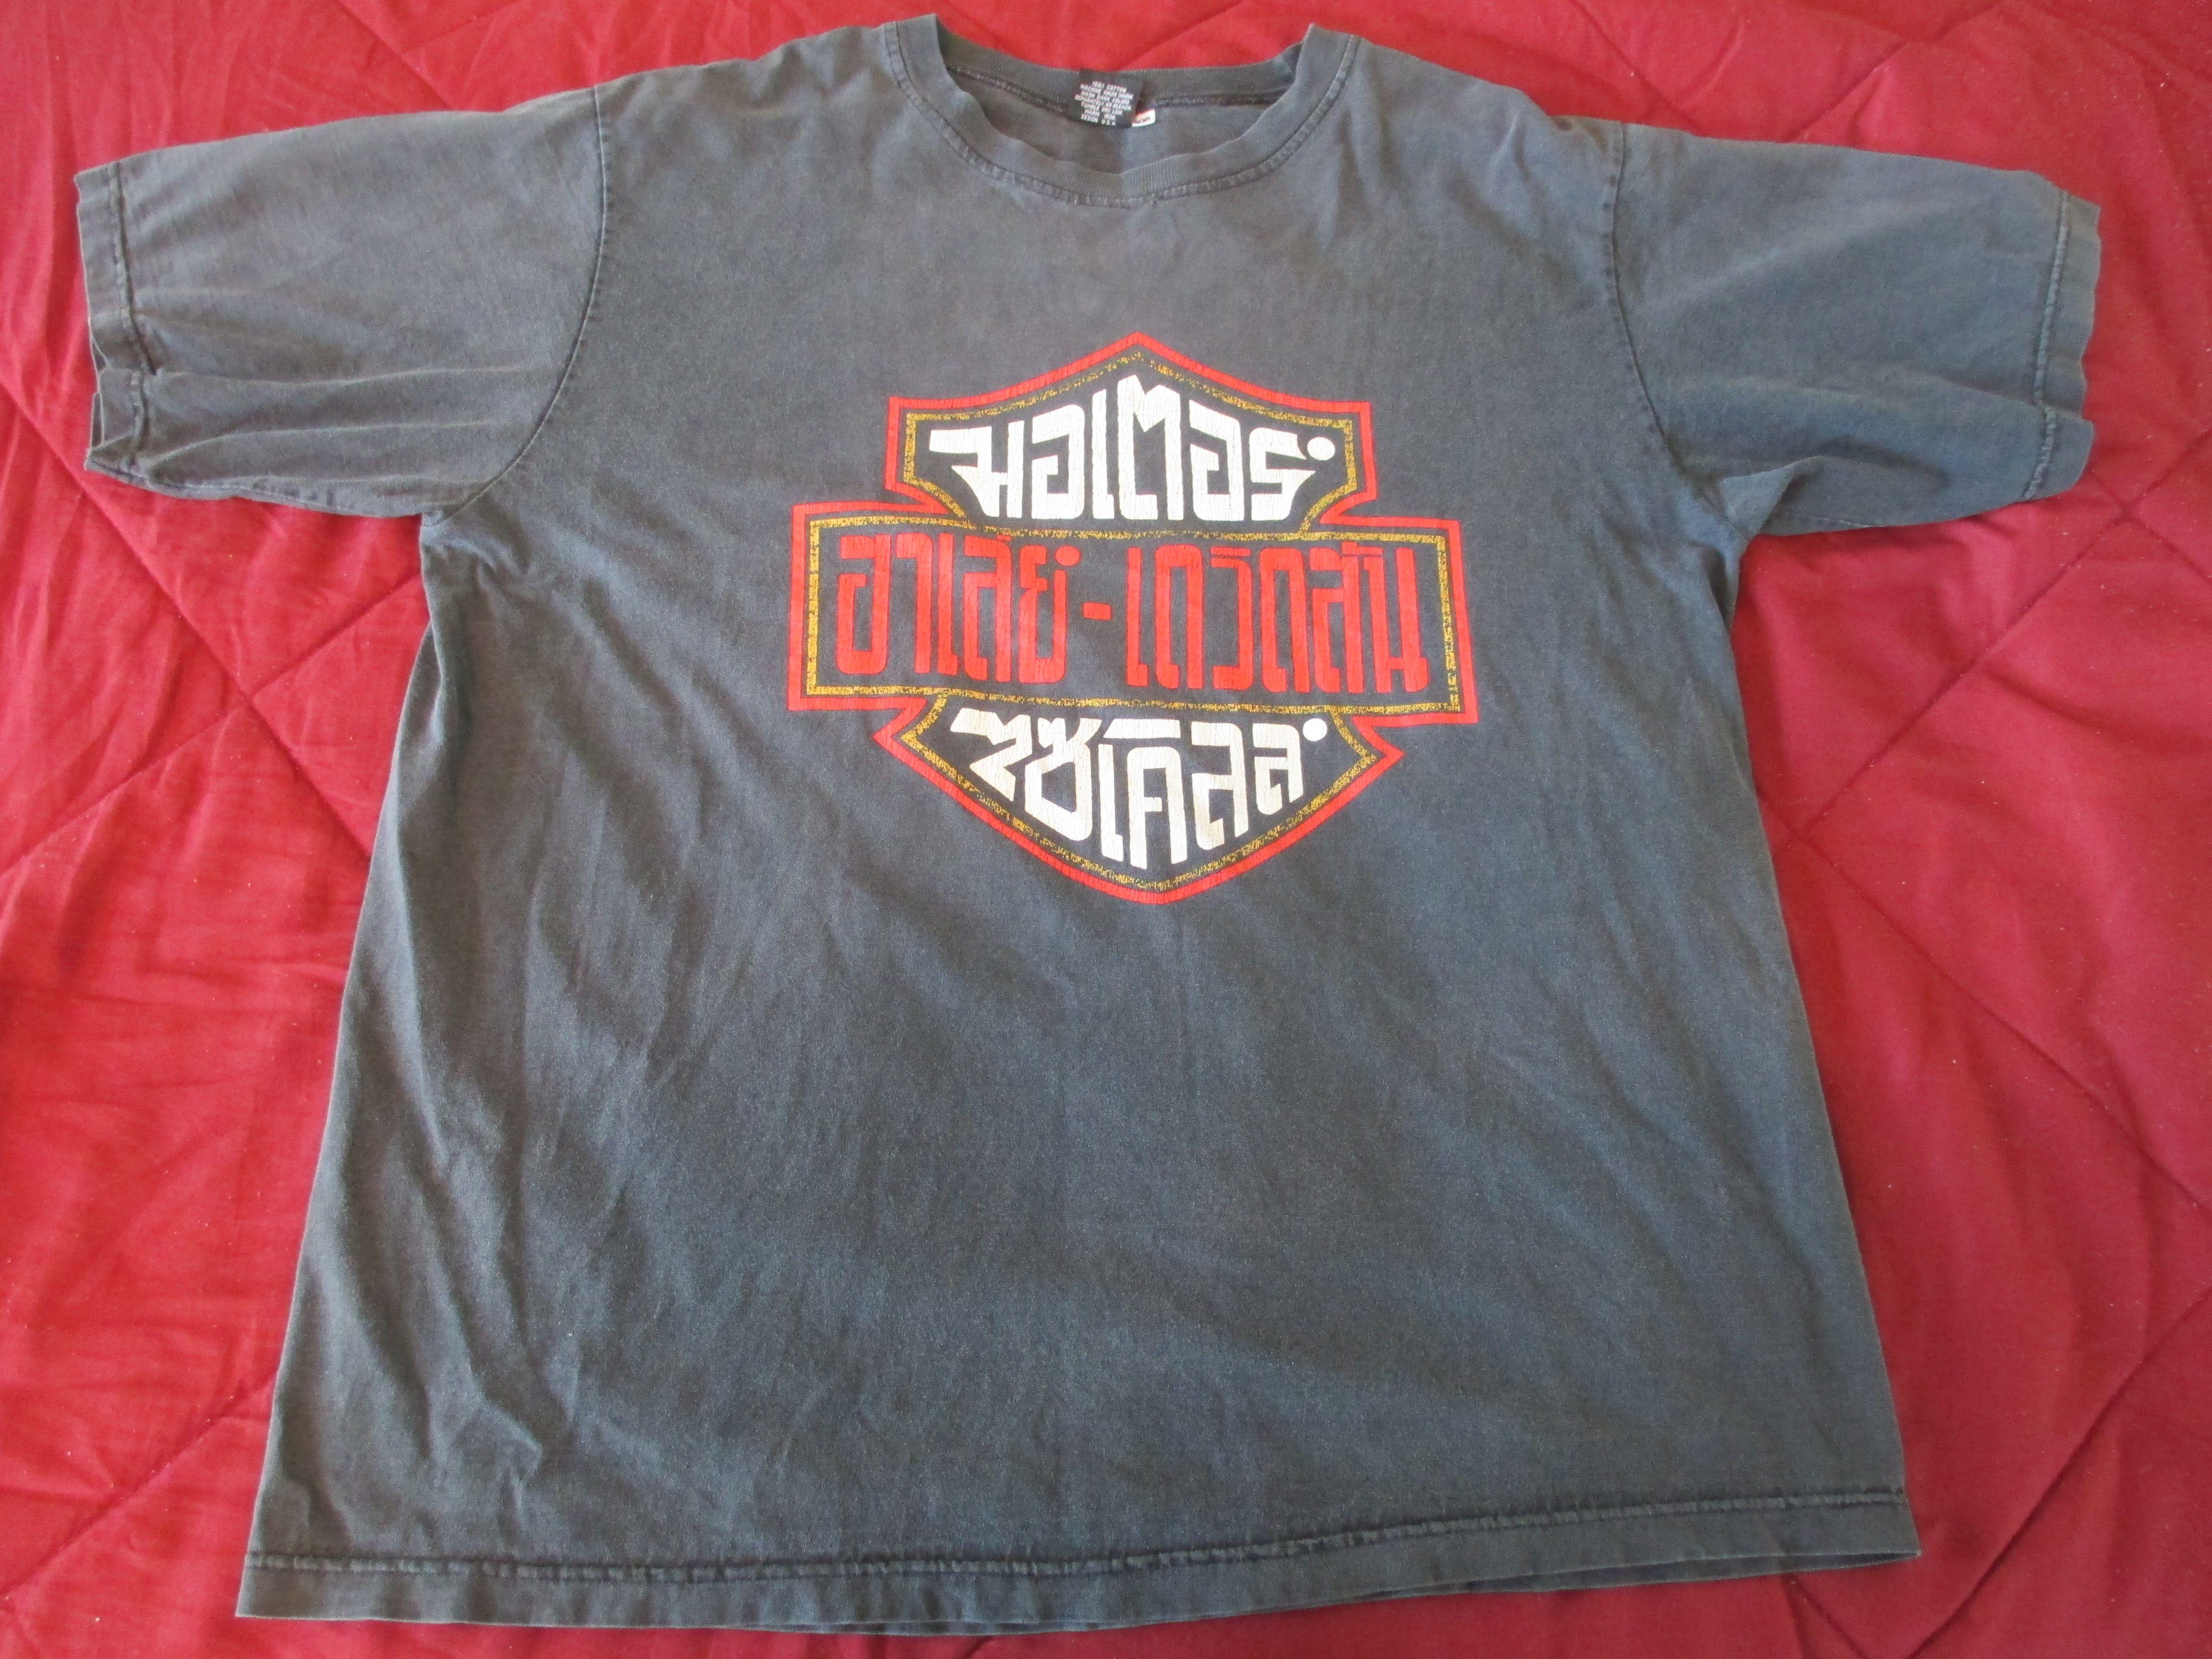 26e53adb Original vintage Harley Davidson foreign language (Thai) logo t-shirt.